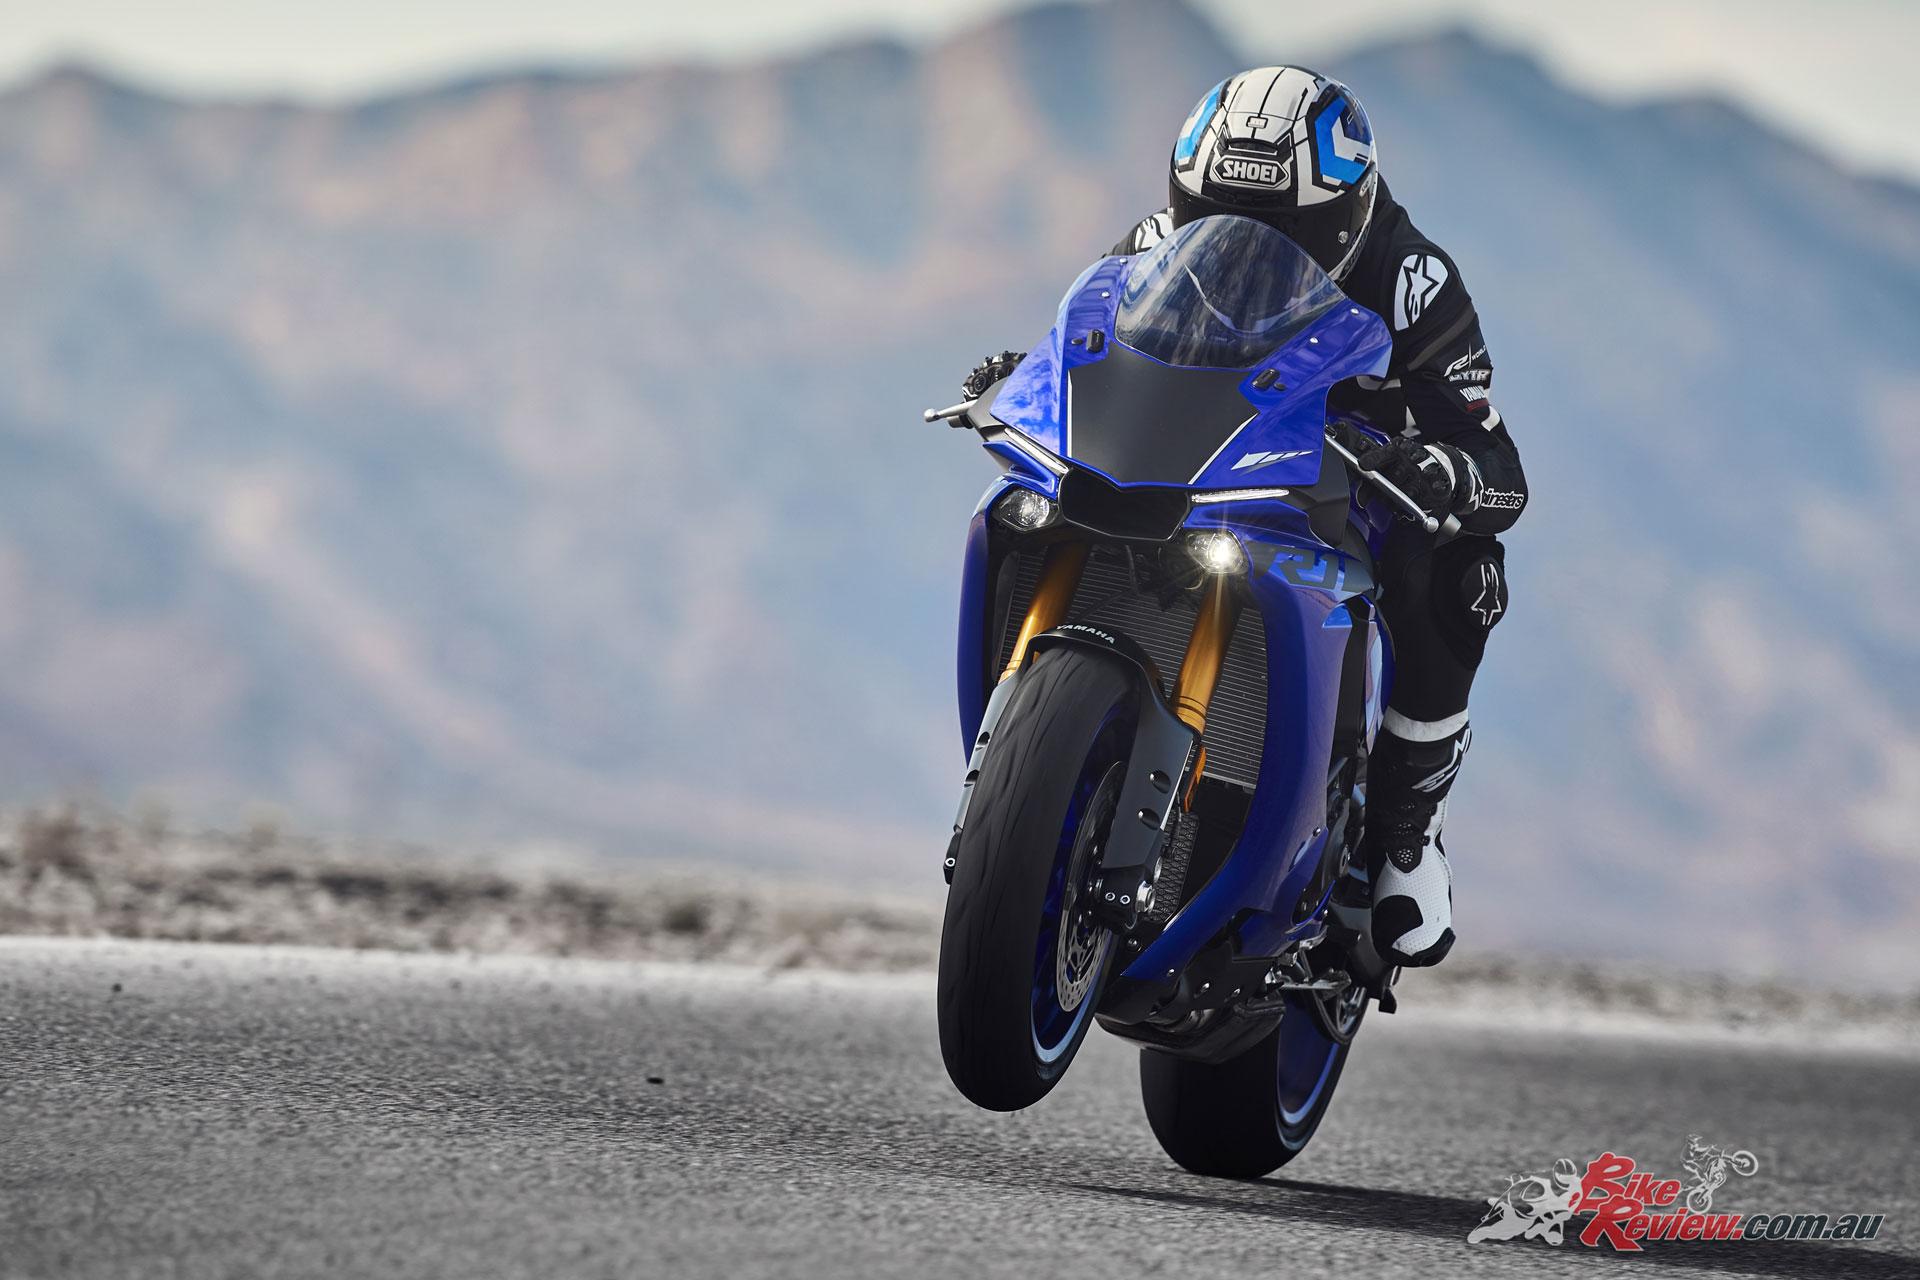 Yamaha Super Tenere Review >> 2018 Yamaha Super Tenere Raid Edition & updated YZF-R1M - Bike Review